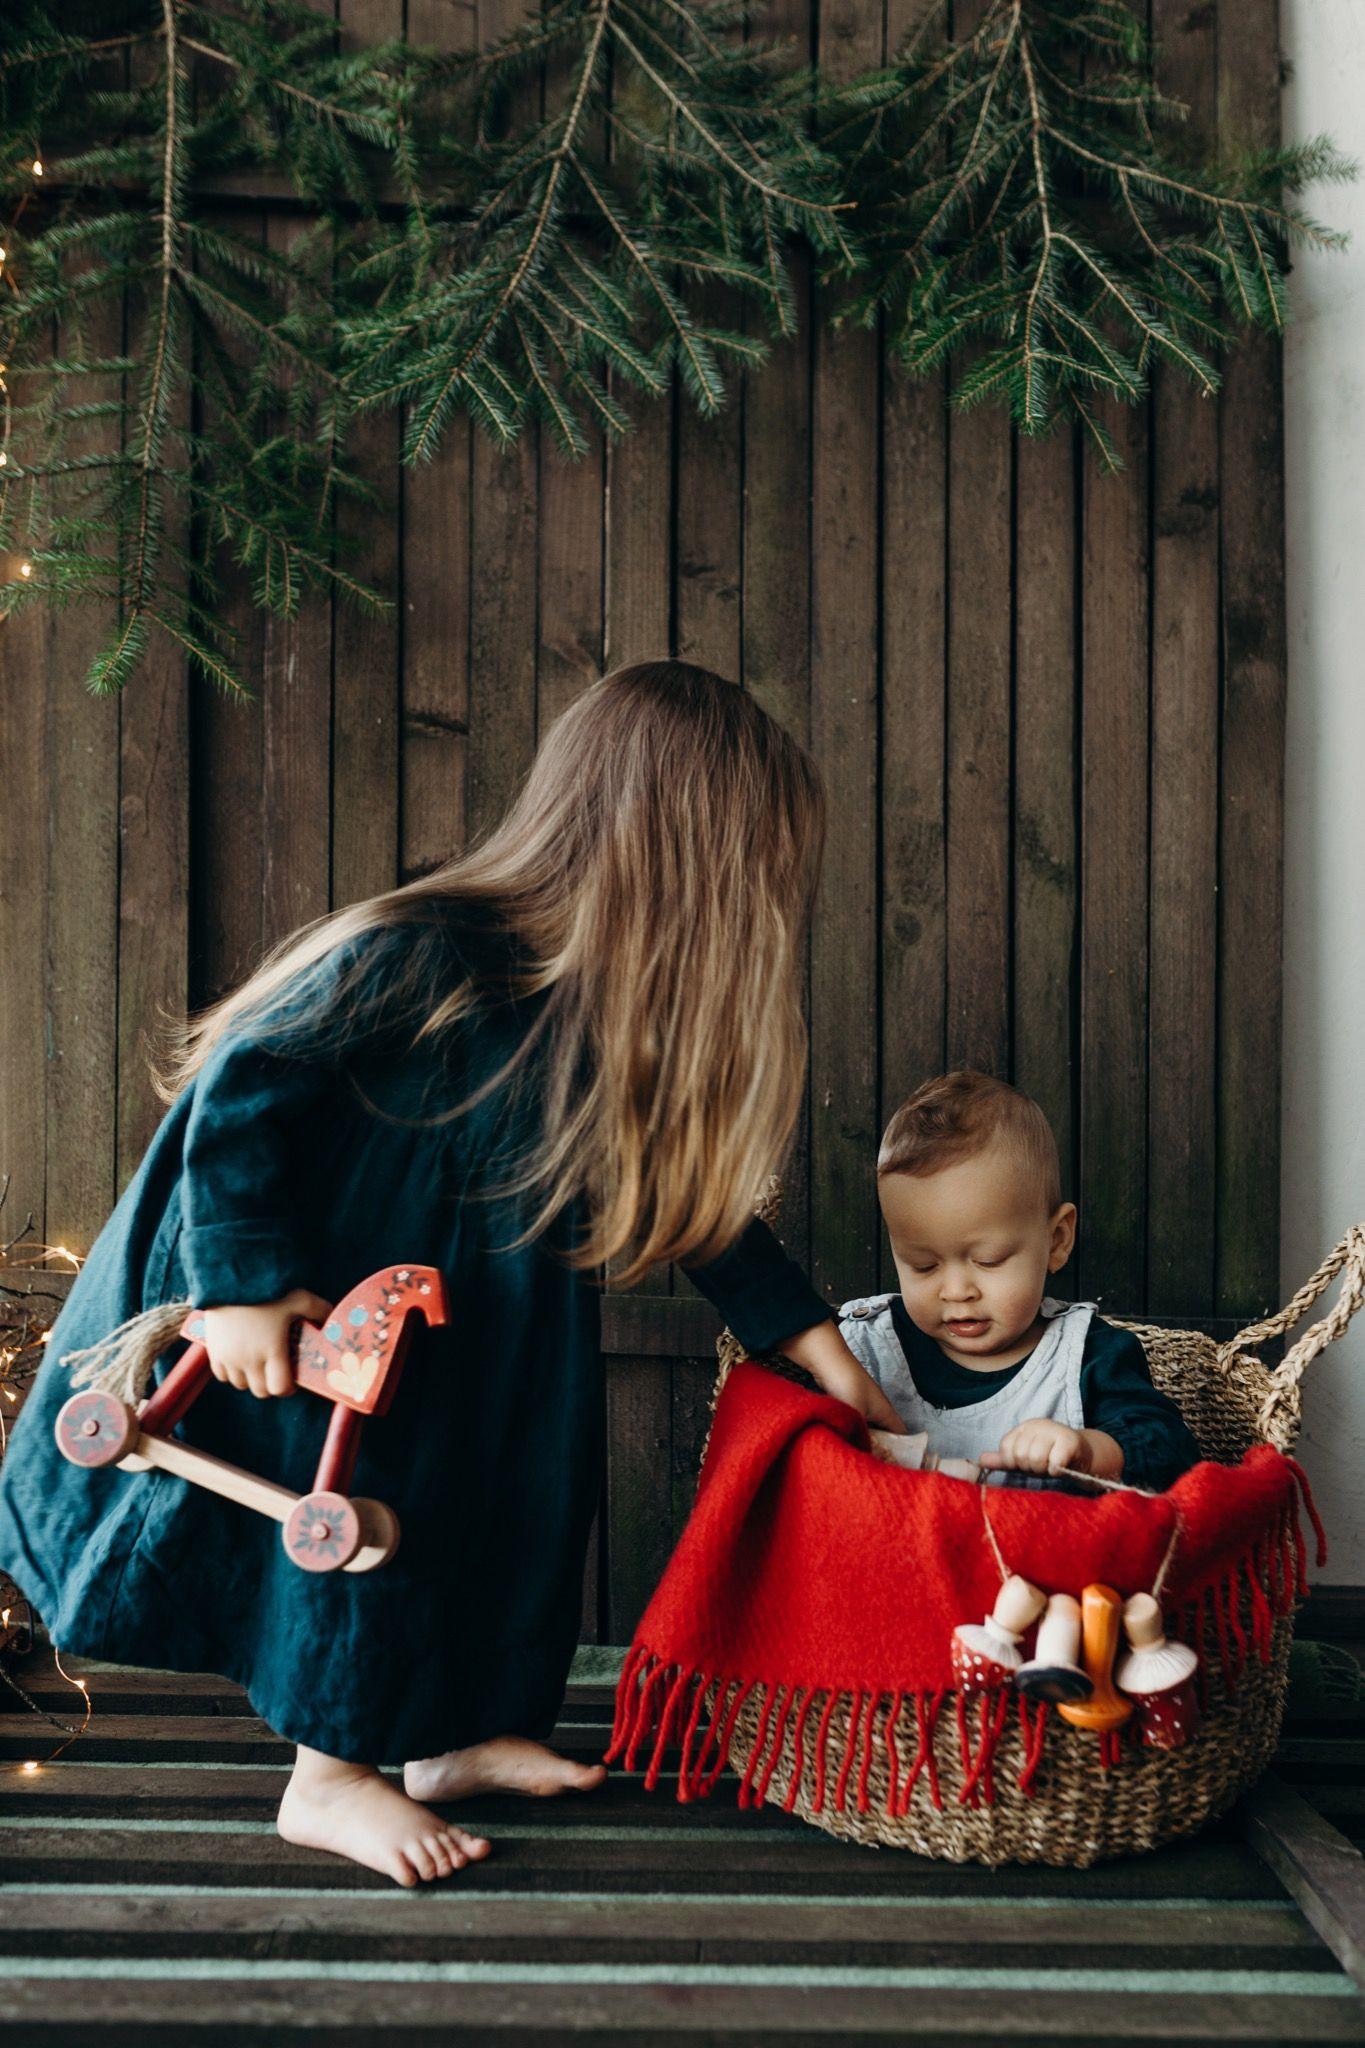 #lapetitealiceshop #christmas #holiday #cozychristmas #cozyevenings #linenchristmas #winterevenings #christmasishere #babyphotography #childrenwear #linenewear #babywear #babyshirt #linenshirt #redblanket #cozyblanket #emroidery #handmadetoys #naturalfibers #consciousfashion #christmasgifts #responsiblefashion #childrenfashion